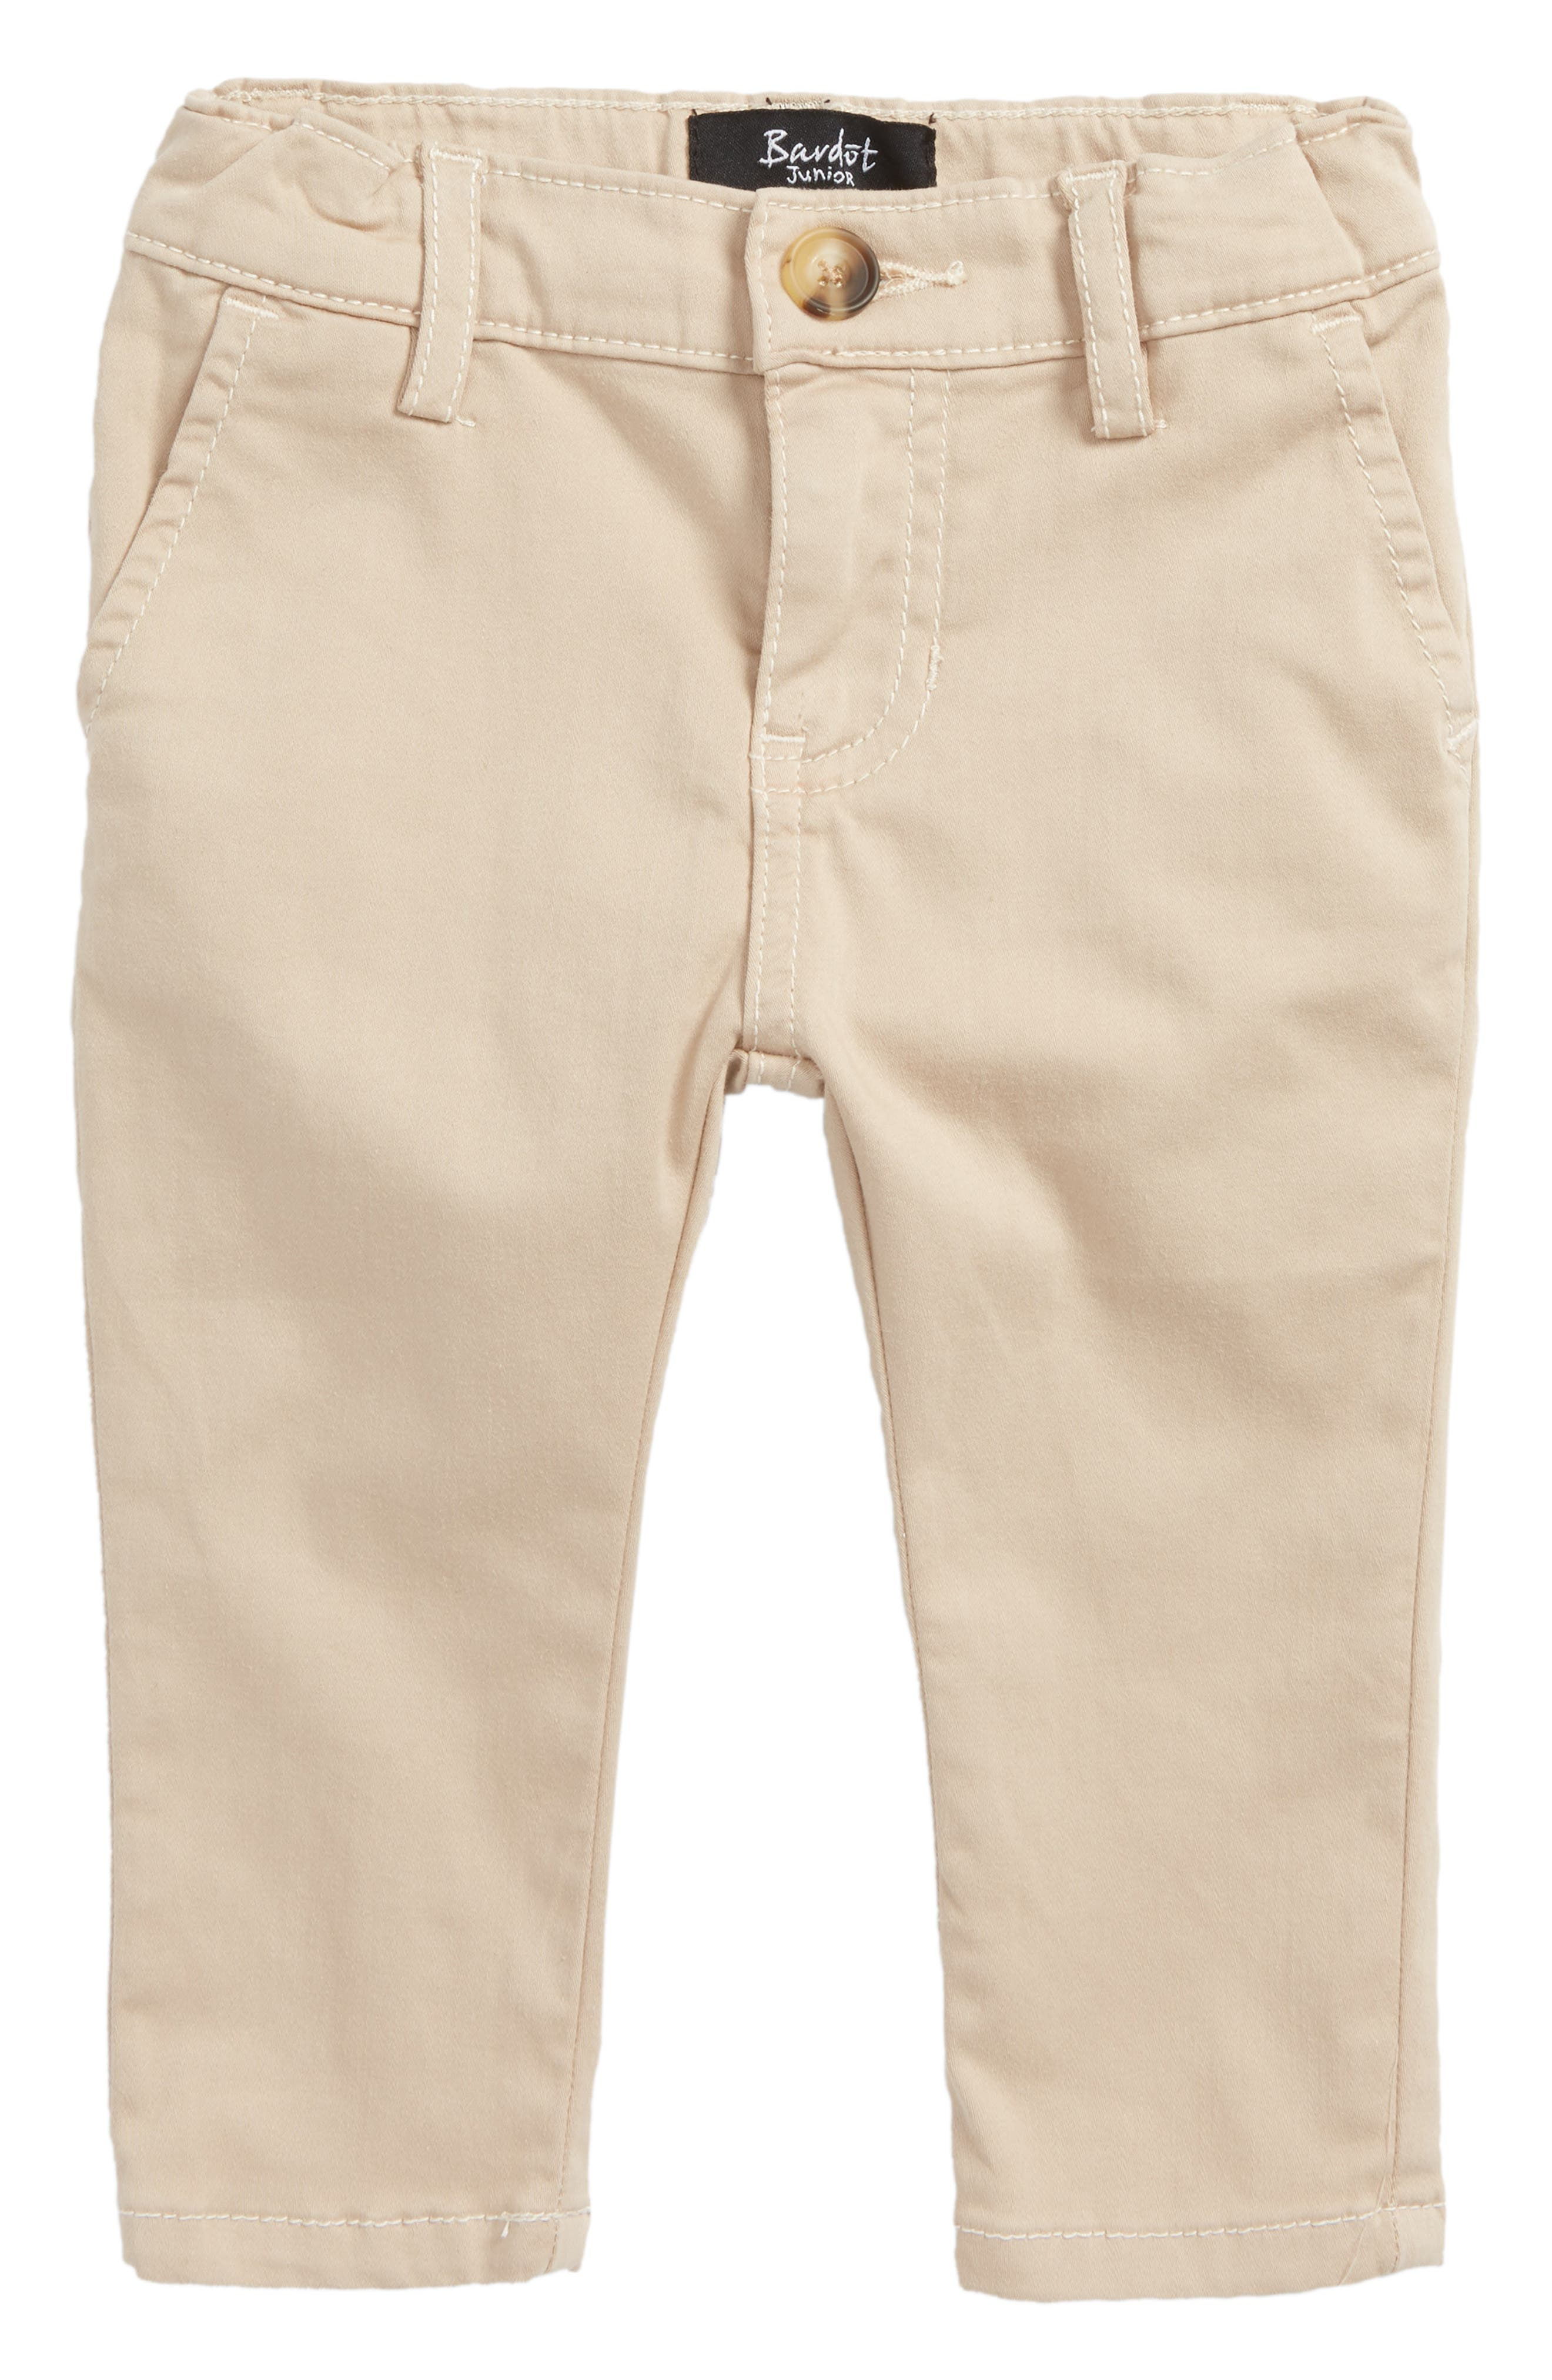 Main Image - Bardot Junior Jack Chino Pants (Baby Boys & Toddler Boys)